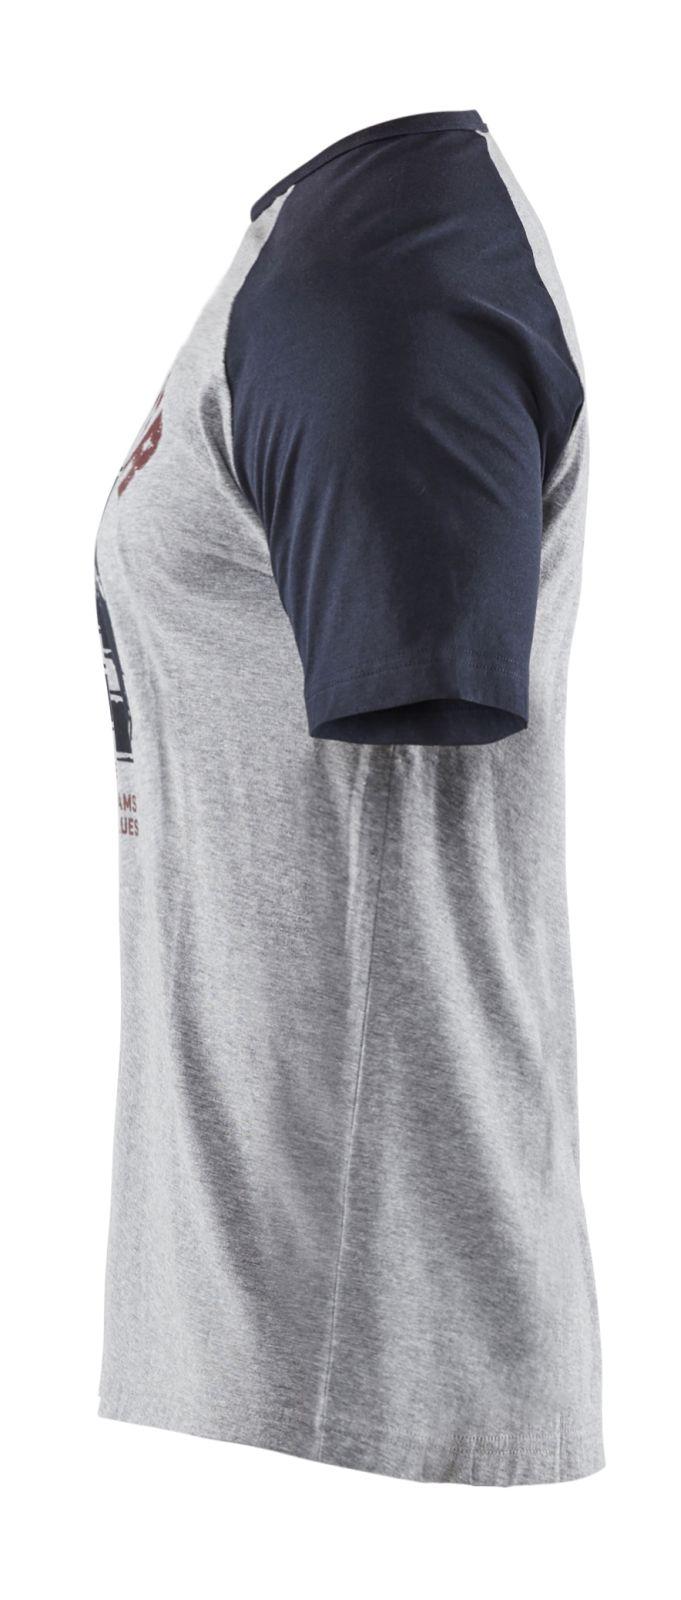 Blaklader Dames t-shirts 94051043 grijs melee-donkerblauw(9086)